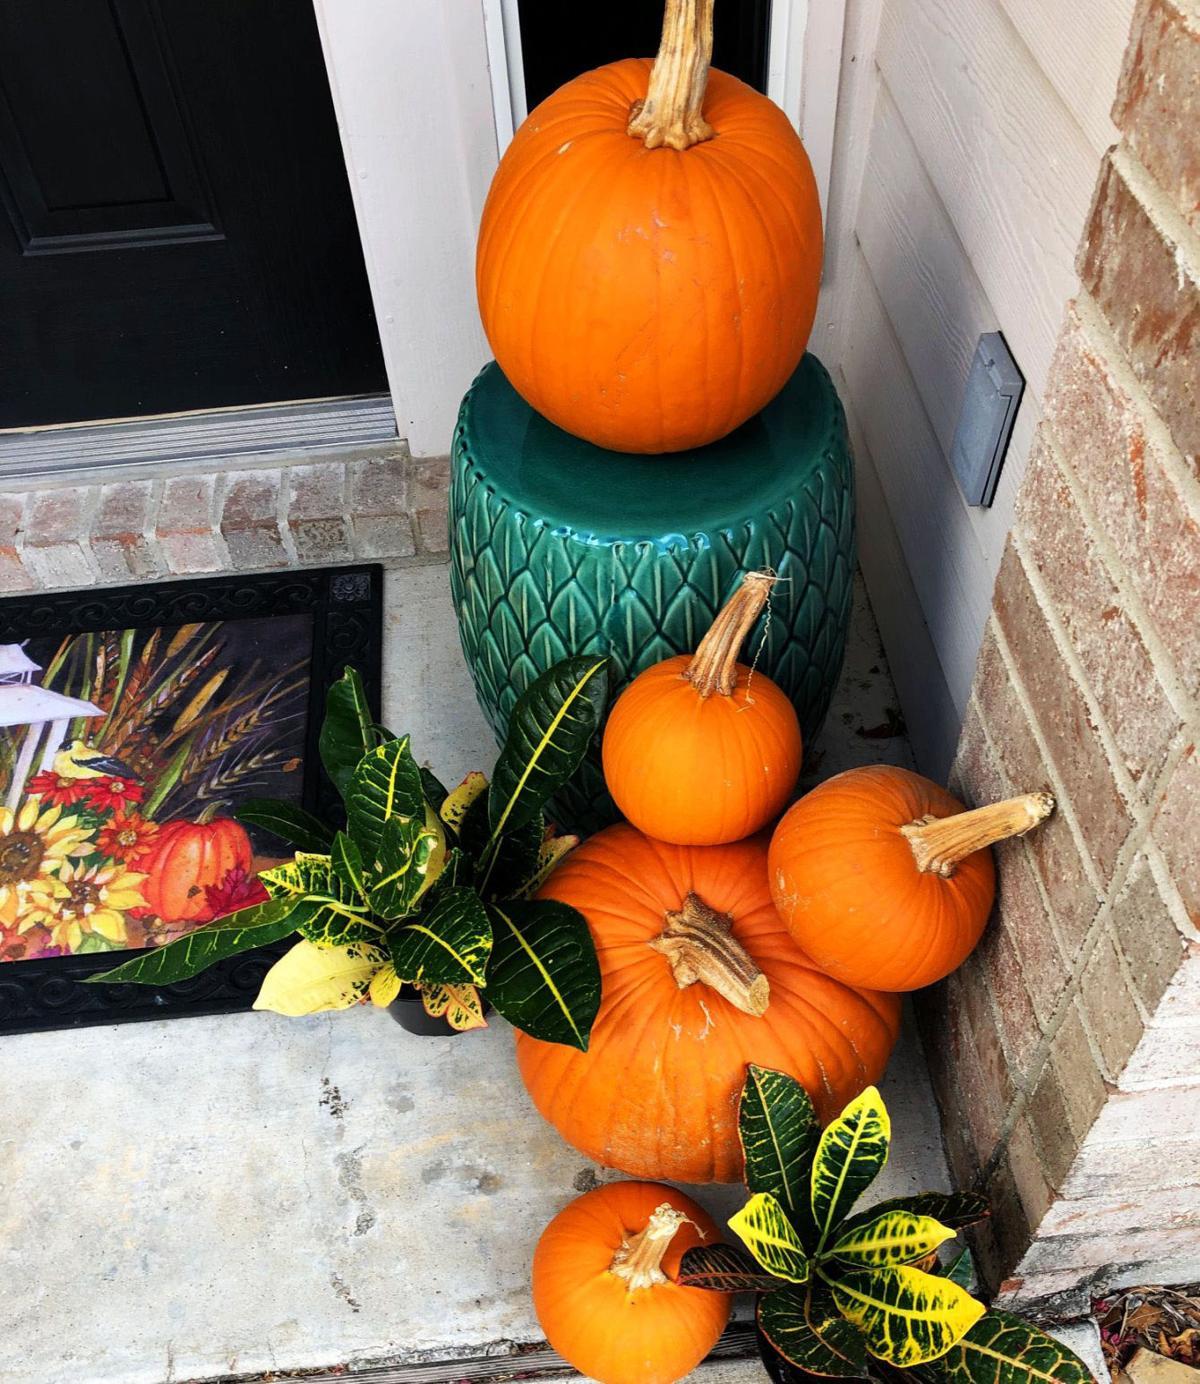 Crotons with pumpkins at front door